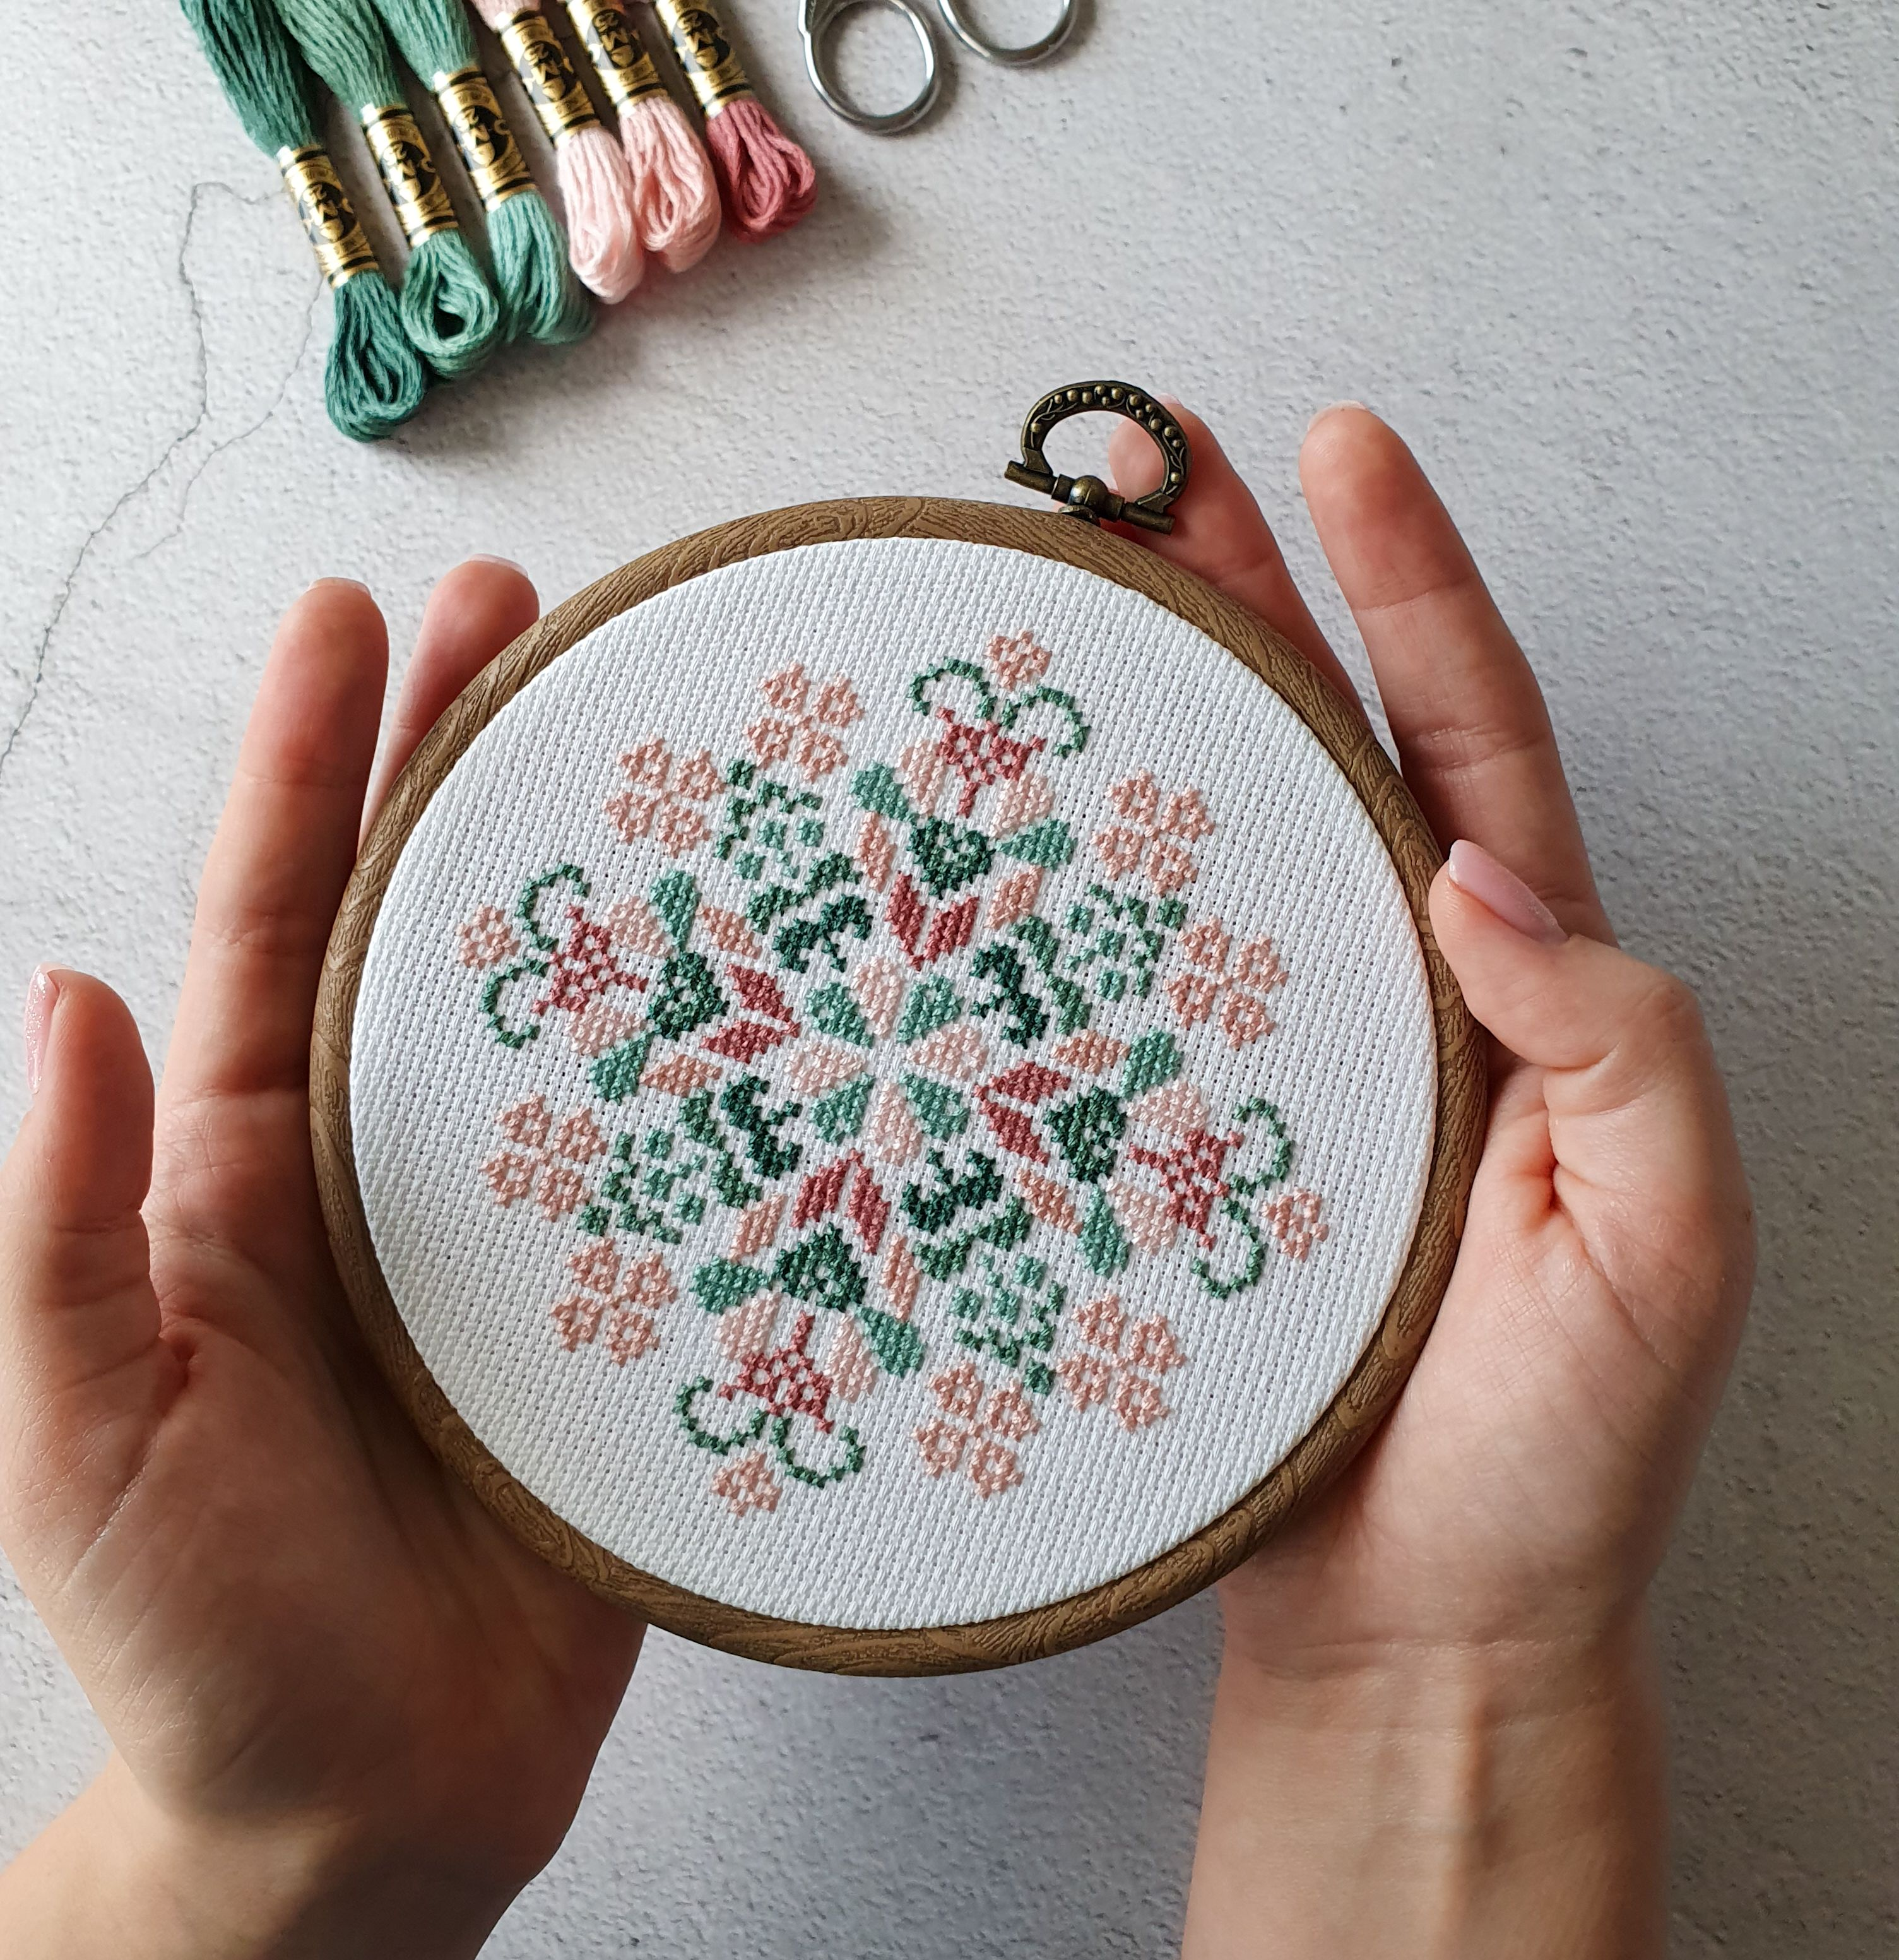 Rainbow Modern Needlepoint Beginner Mandala Animal Patterns Colorful Best Sellers Cross Stitch Patterns Set Easy Embroidery Designs